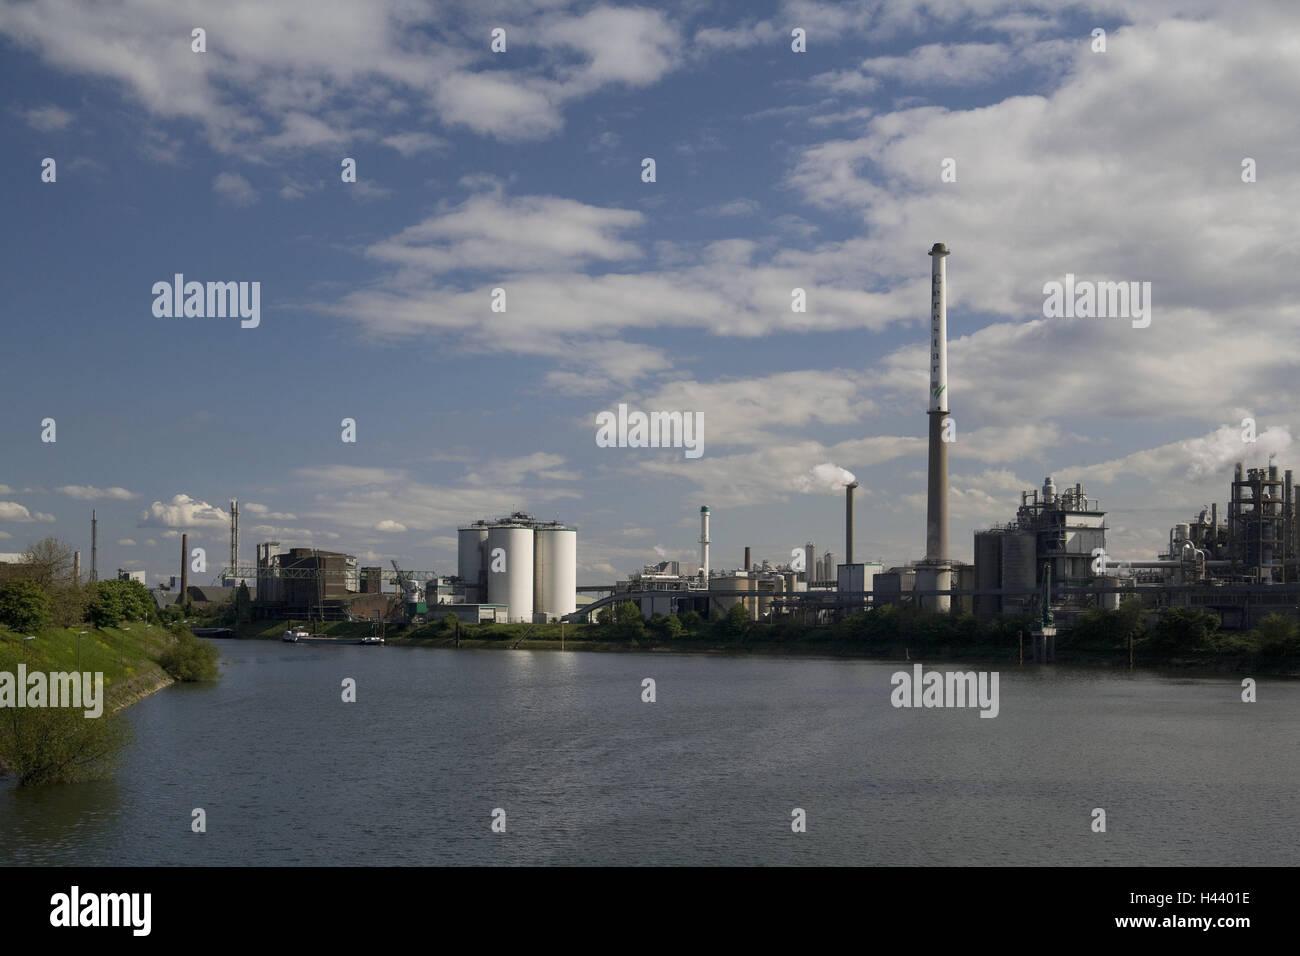 Germany, North Rhine-Westphalia, Krefeld, Uerdingen, Rhine harbour, industrial plant, refinery, river, the Rhine, - Stock Image